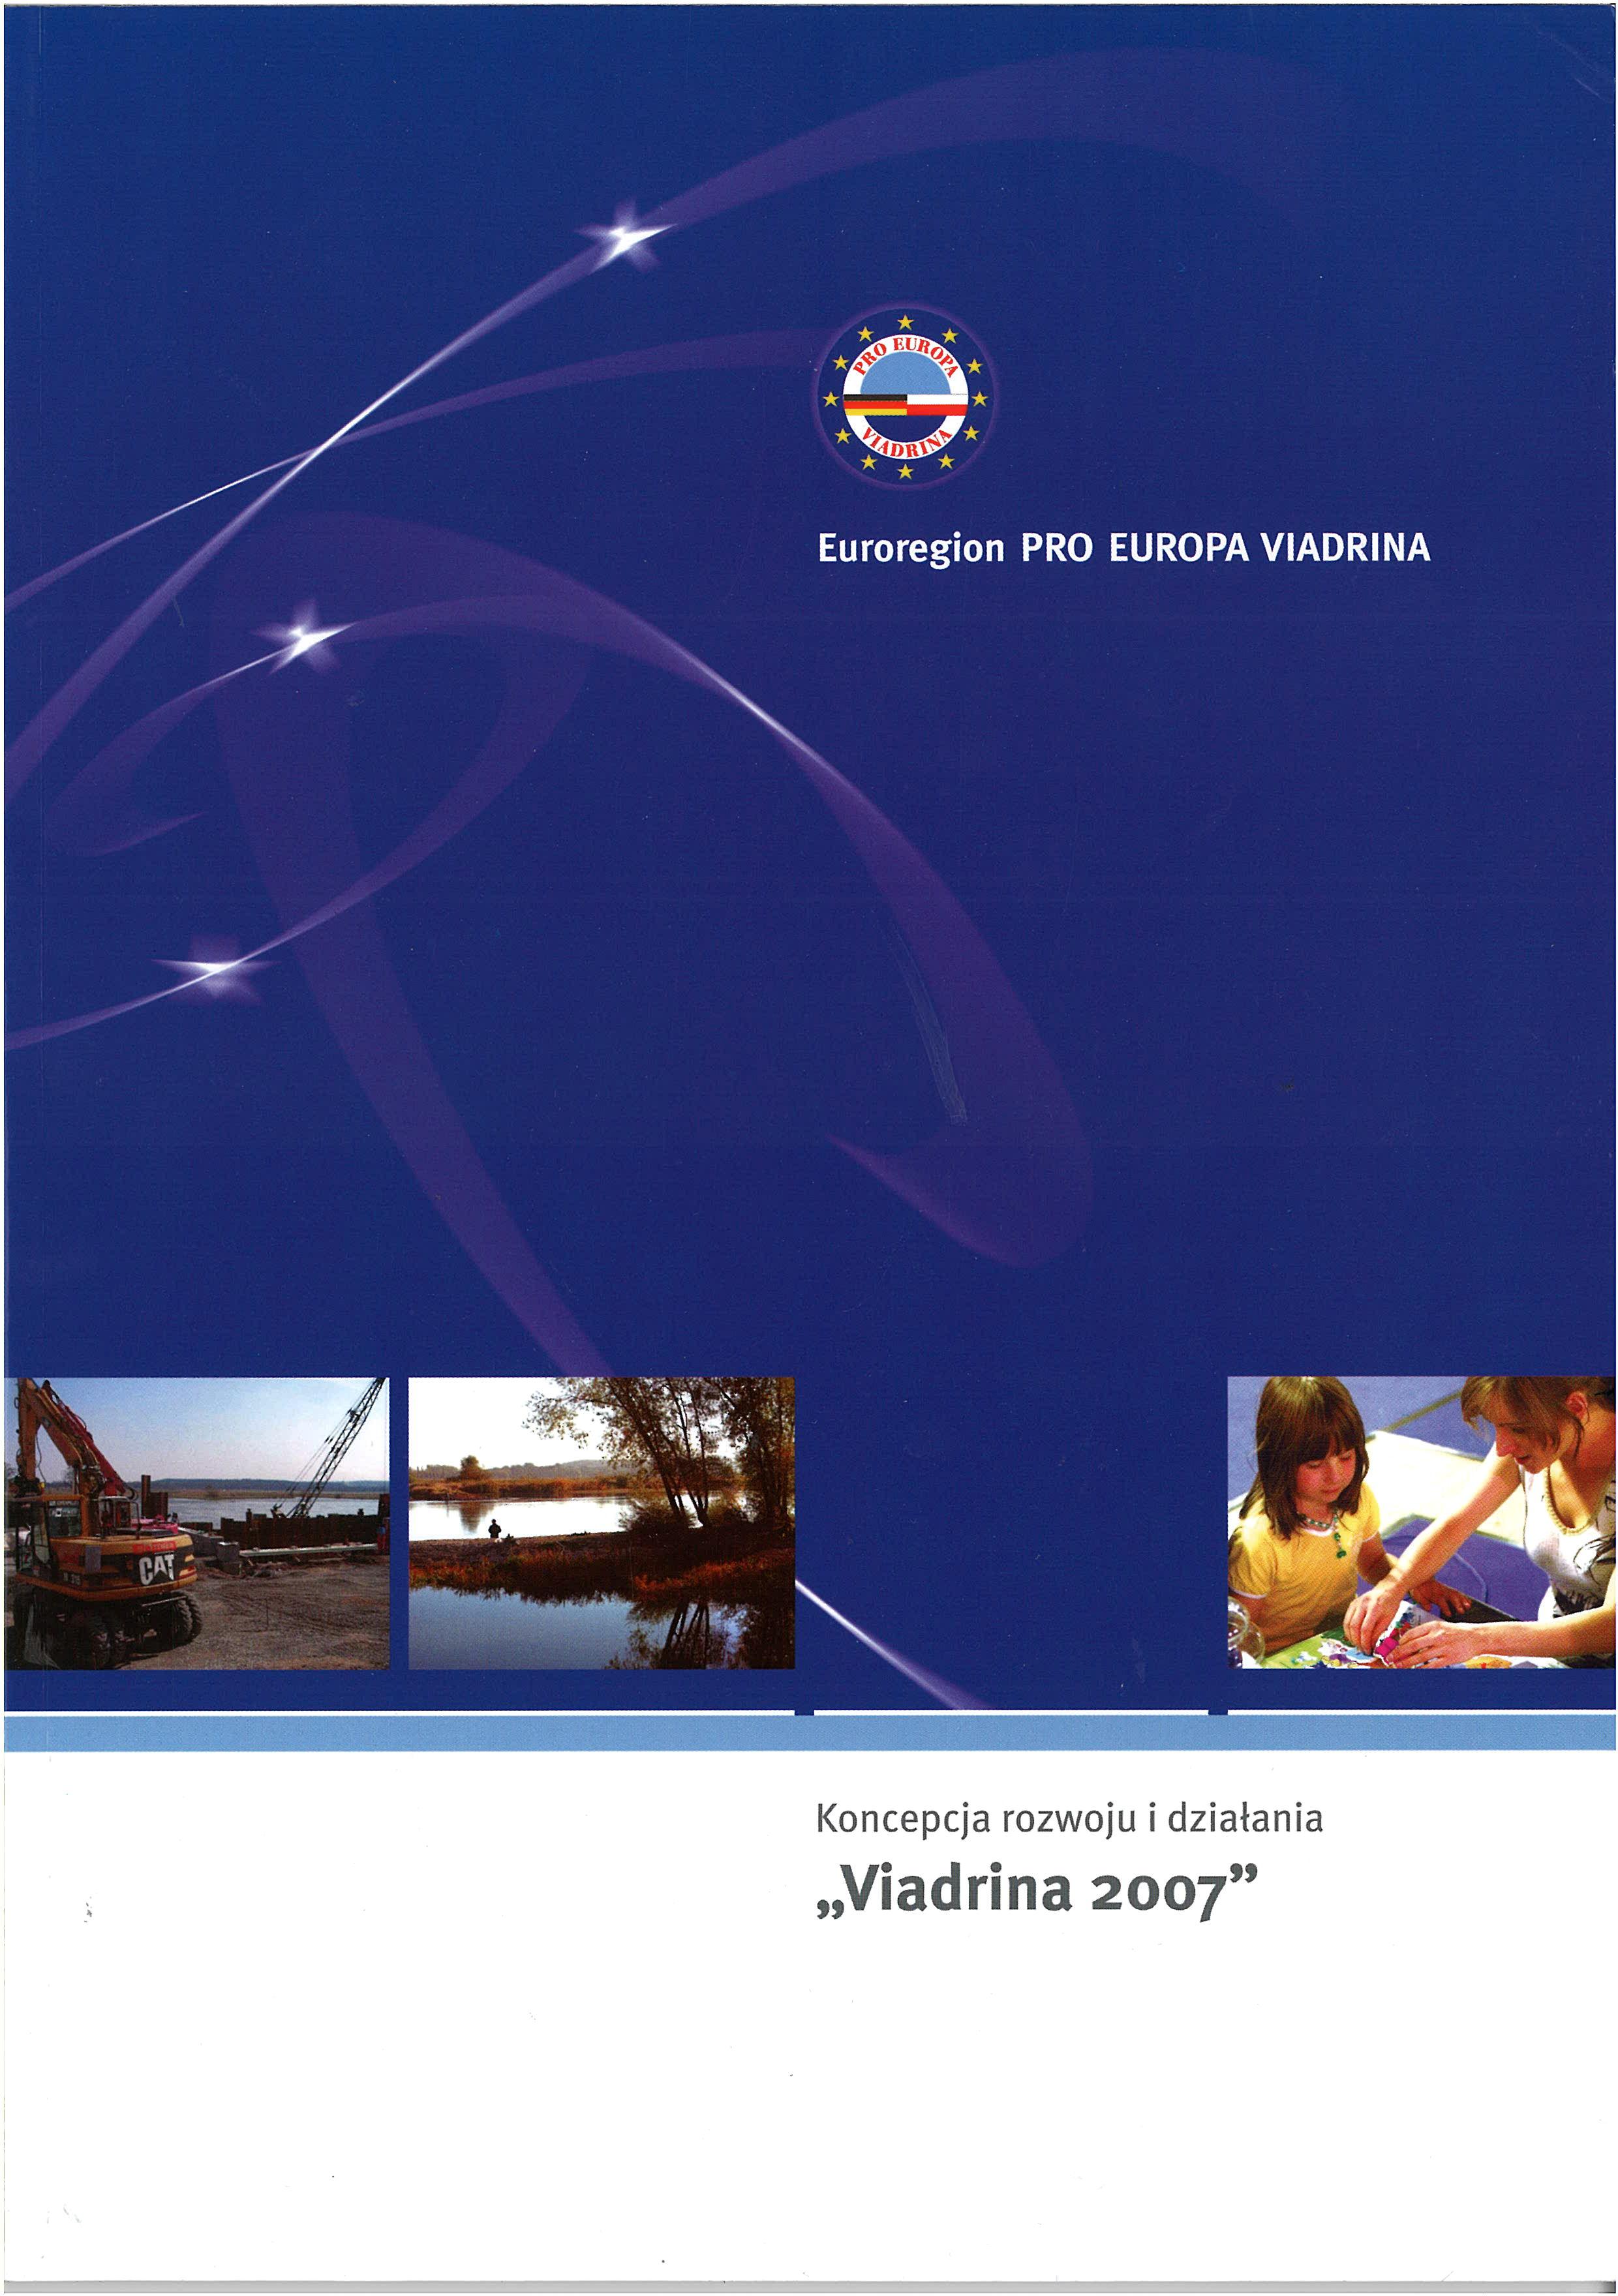 KoncepcjaRozwoju i Dzialania-E-PEV-VIADRINA-2007